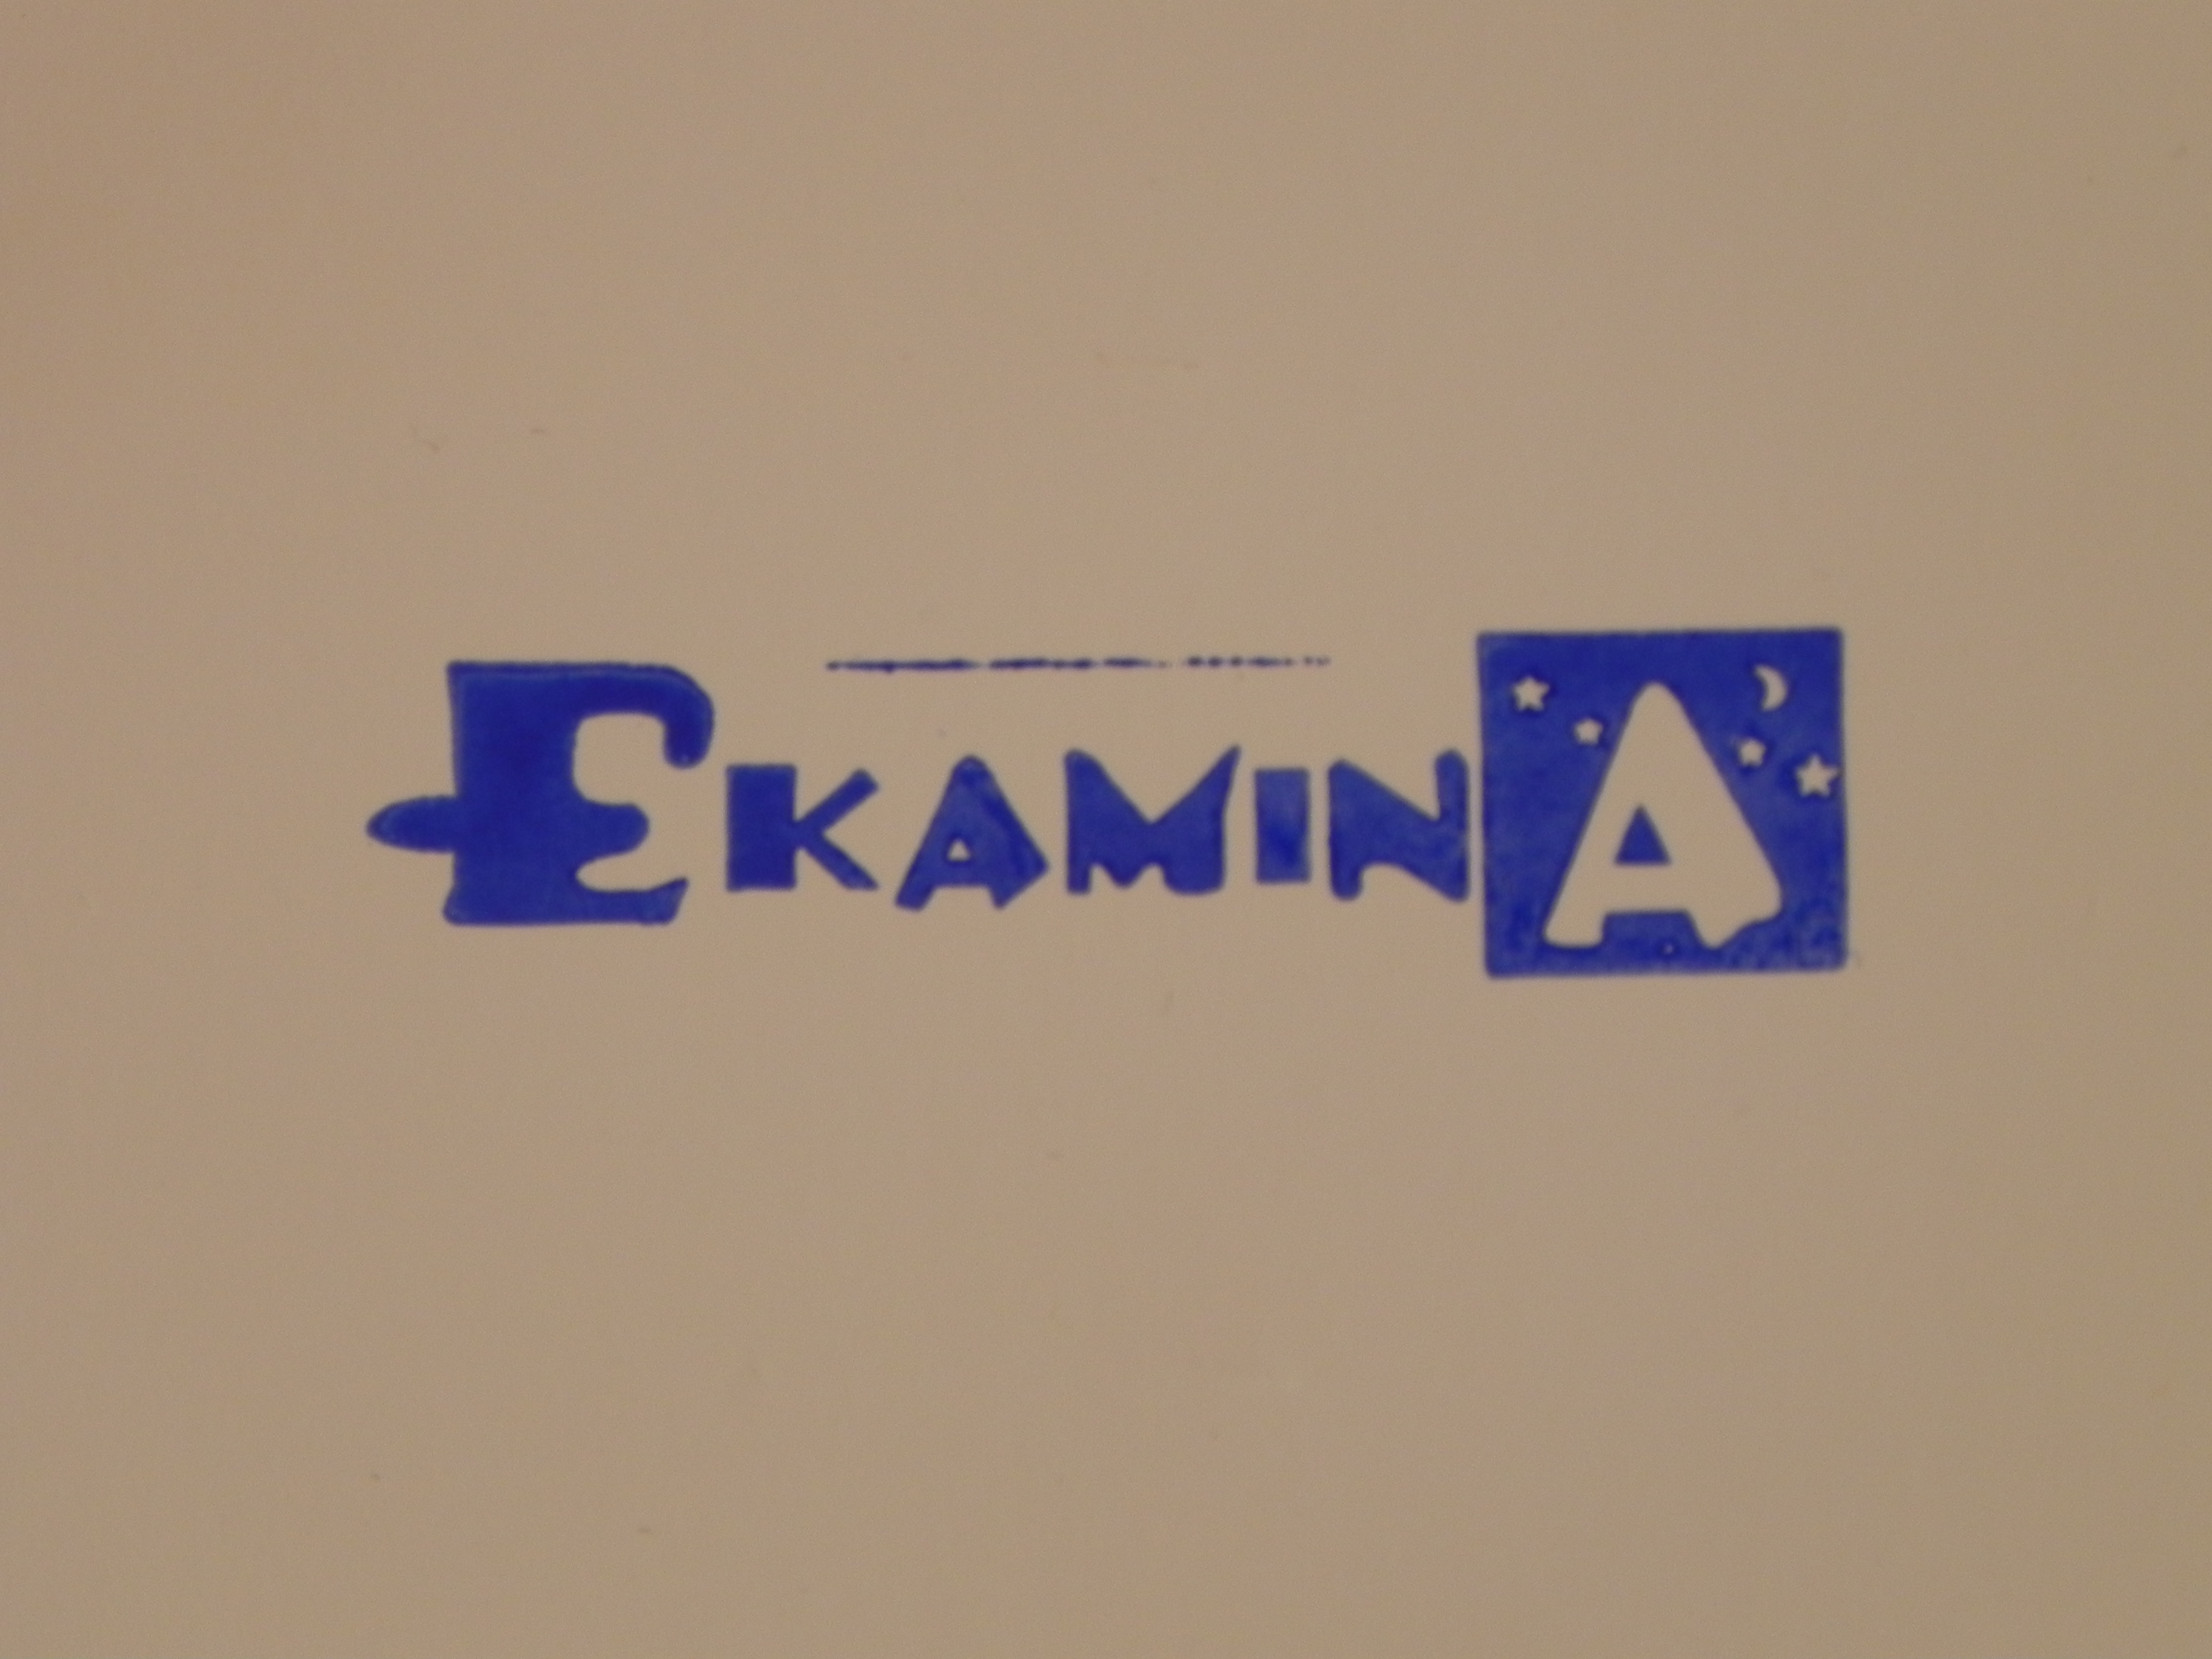 ekamina